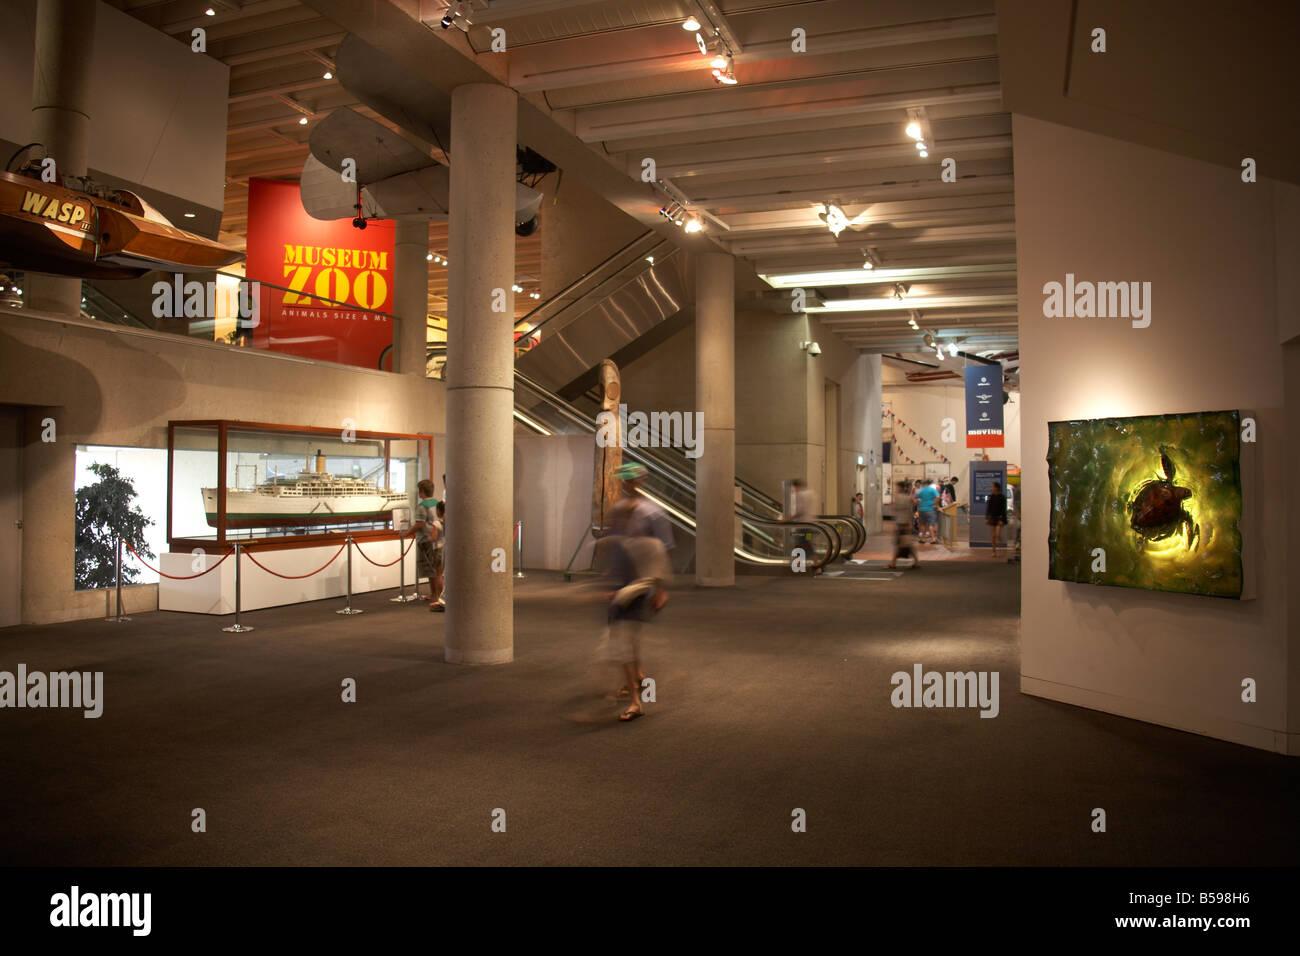 Australisch Familie Interieur : Interieur ausstellung museum zoo abend beleuchtung in brisbane